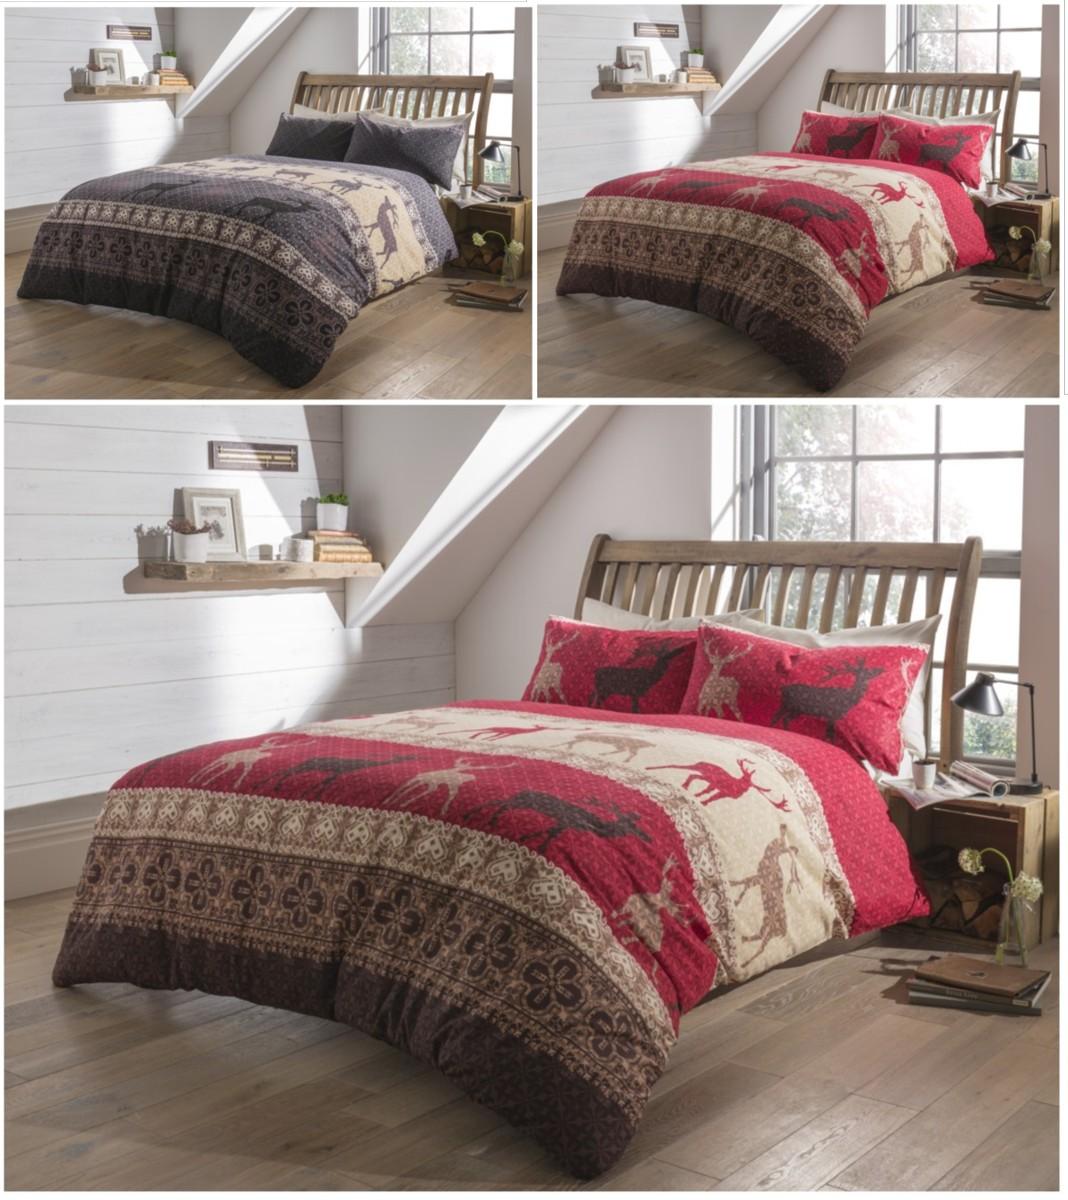 fair isle flannelette stag brushed cotton christmas duvet. Black Bedroom Furniture Sets. Home Design Ideas